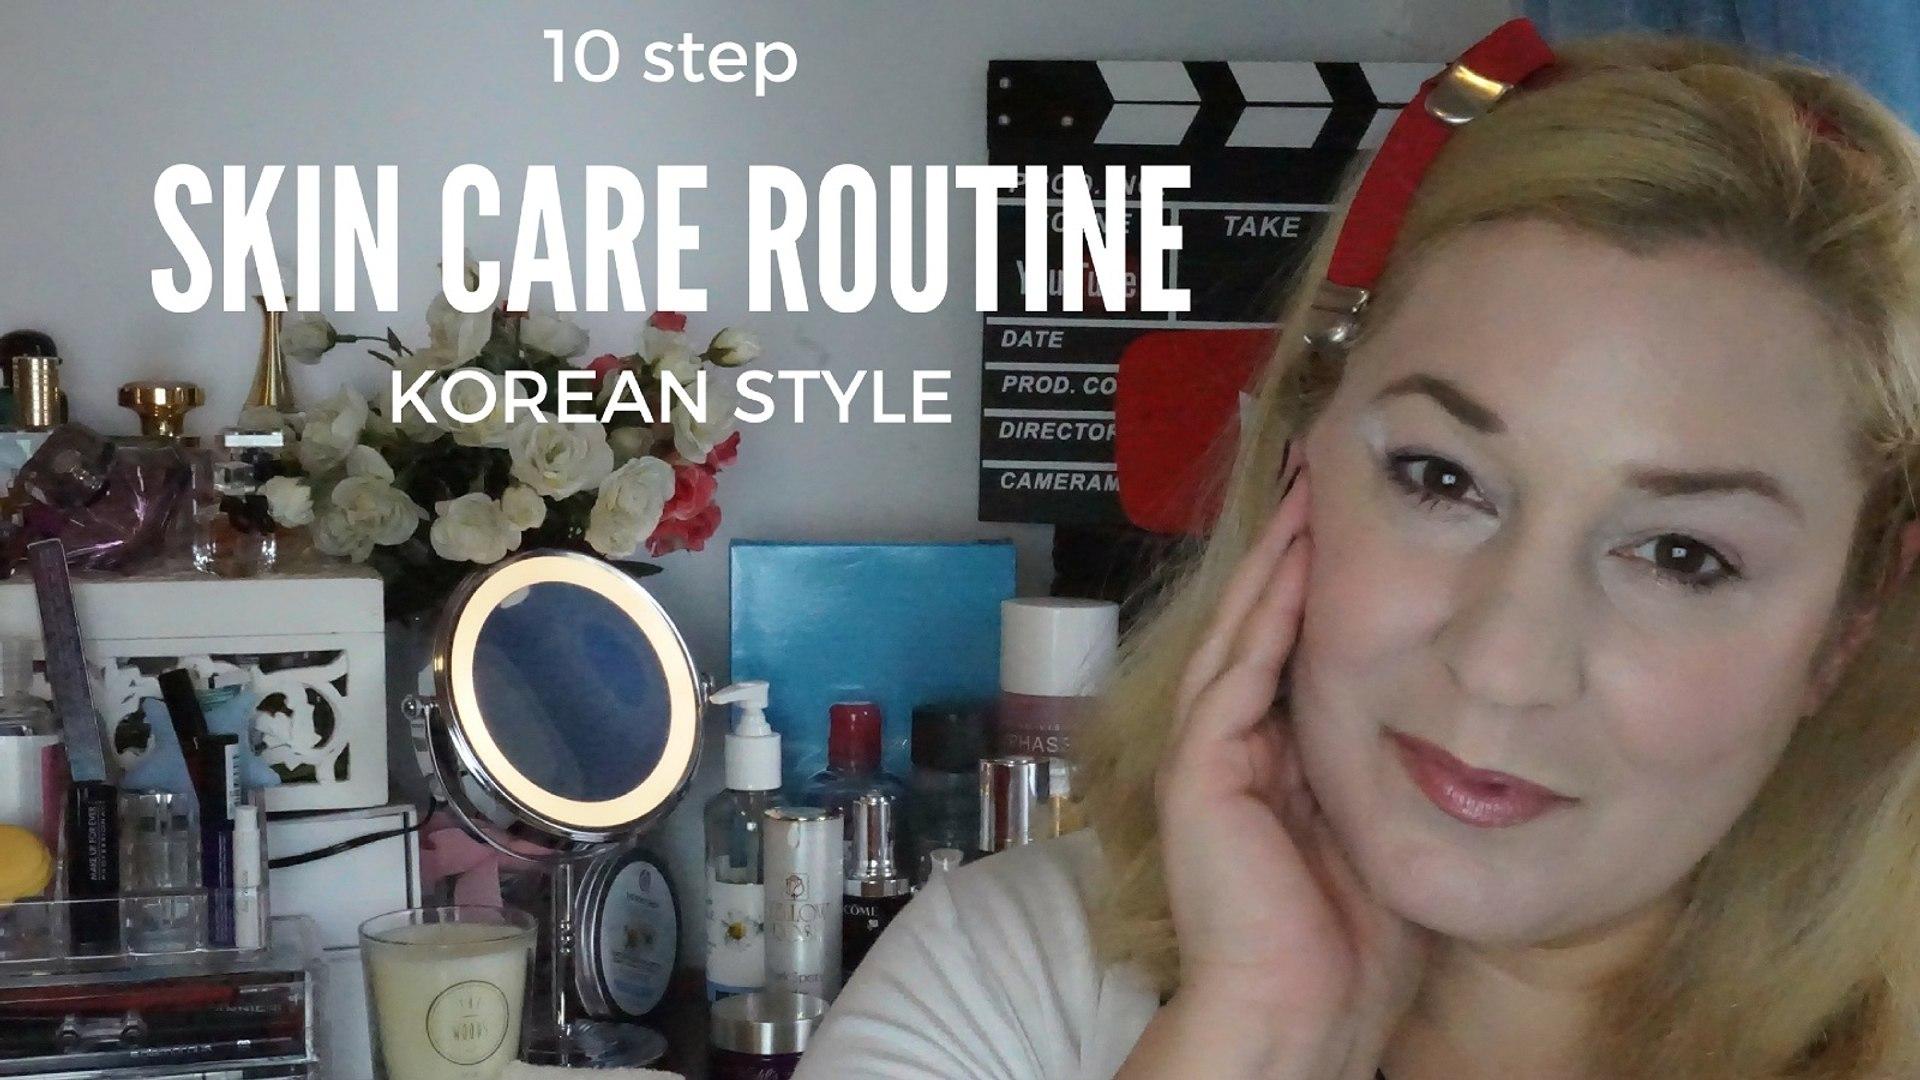 10 step skincare routine (Korean Style) - GR